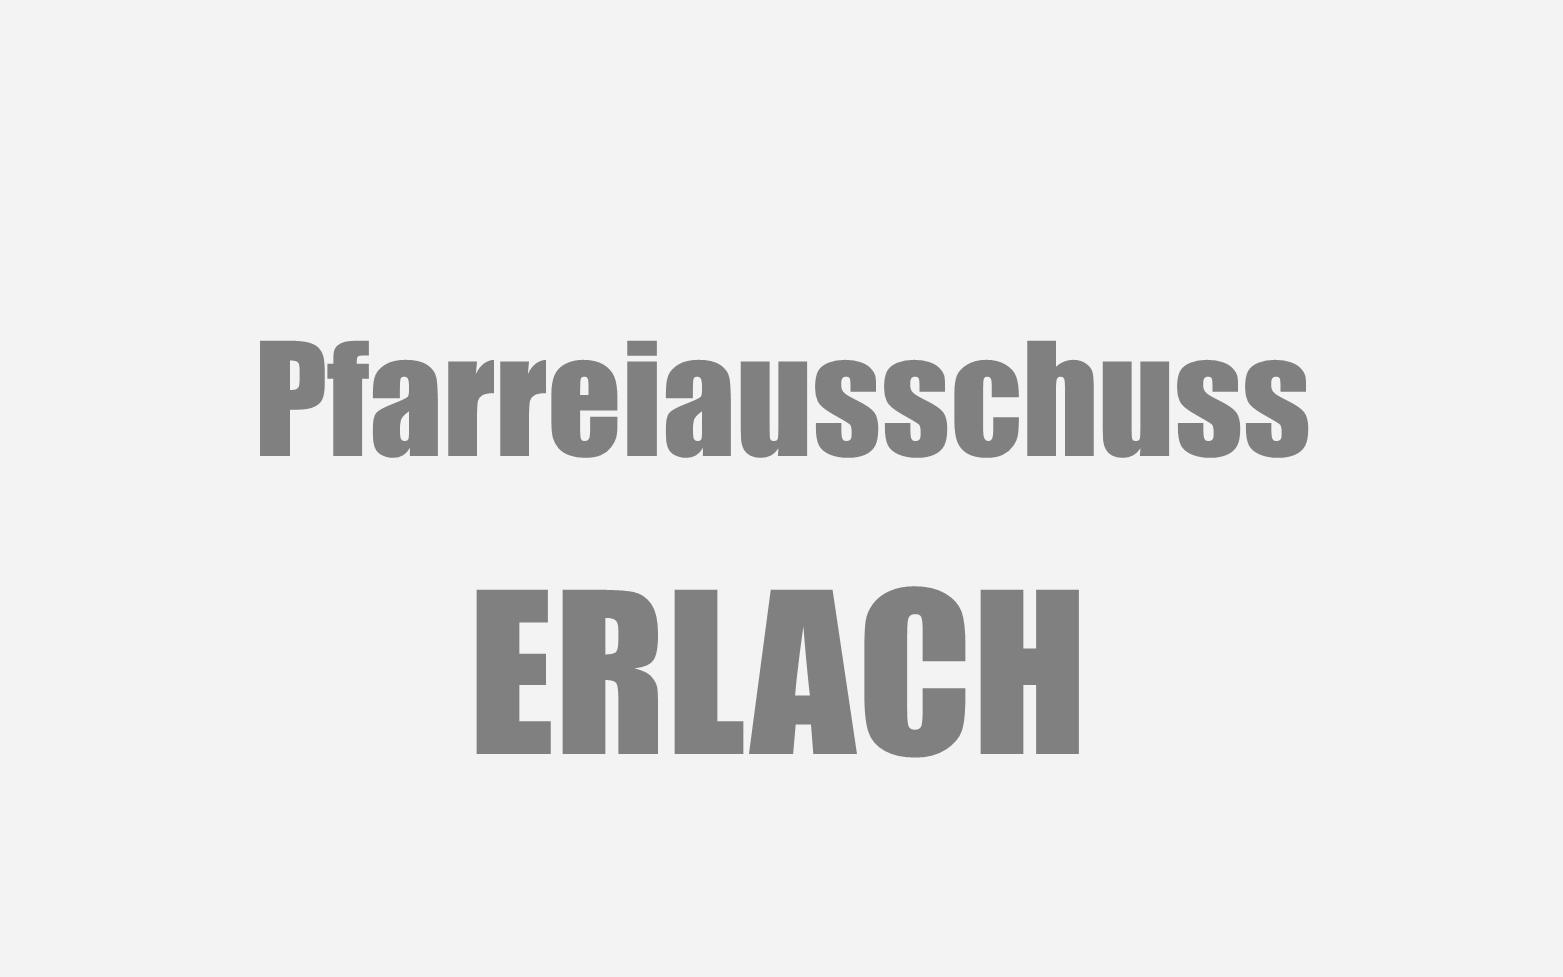 Erlach Pfarreiausschuss Symbolbild